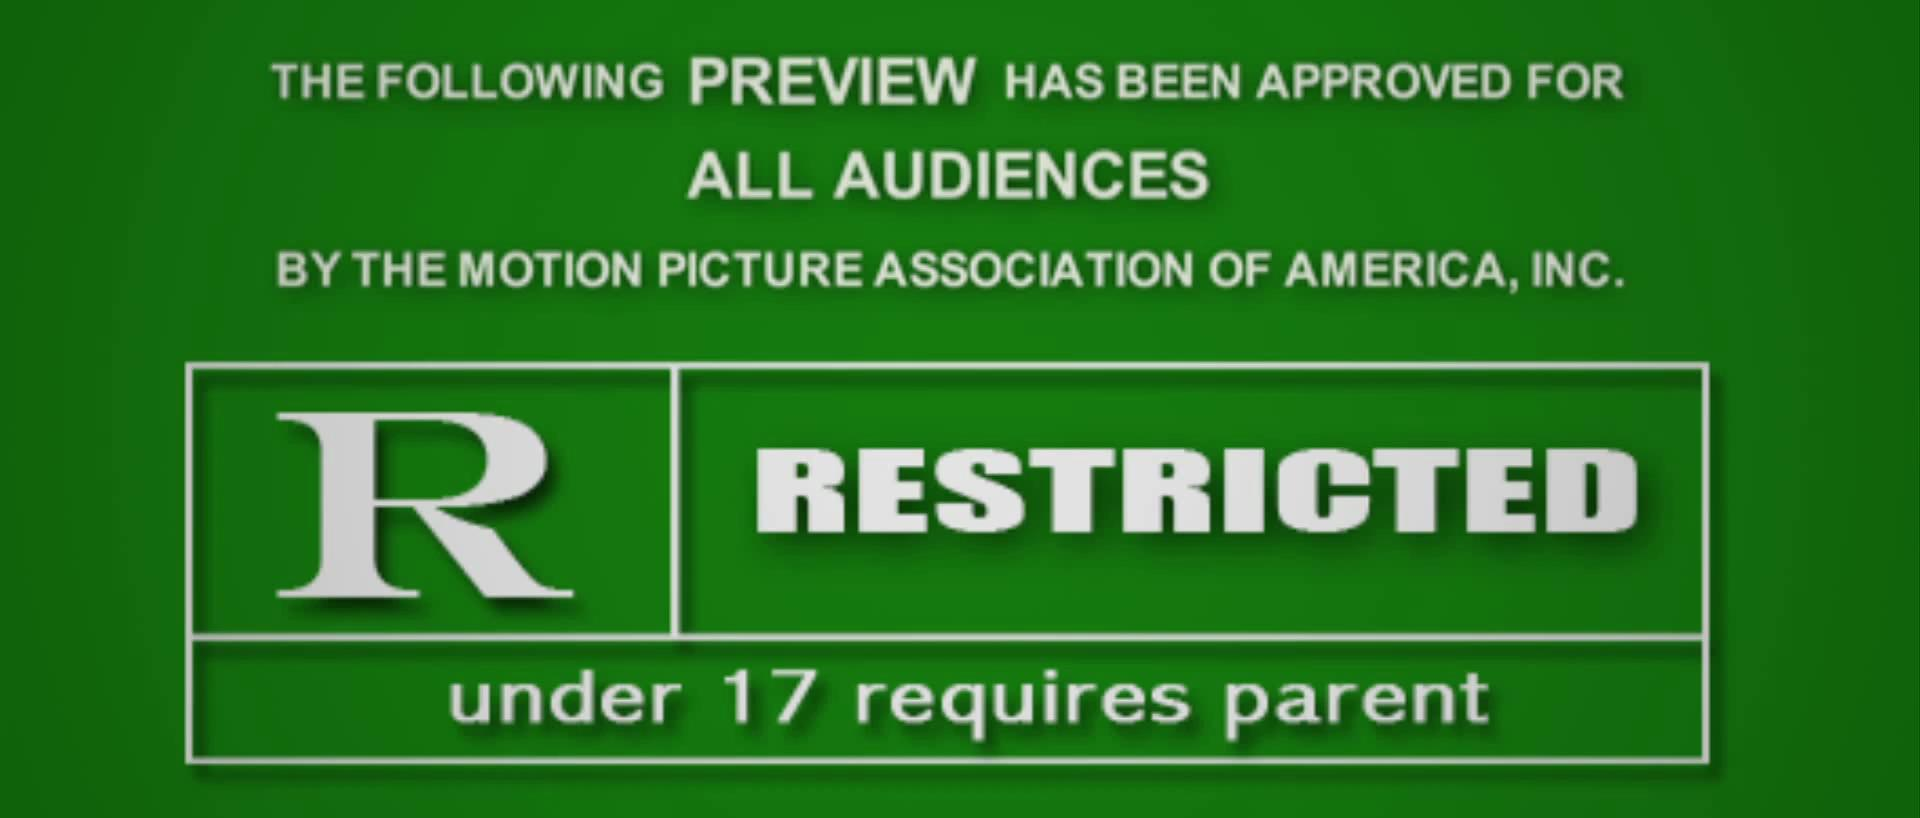 rfmt-01-rating